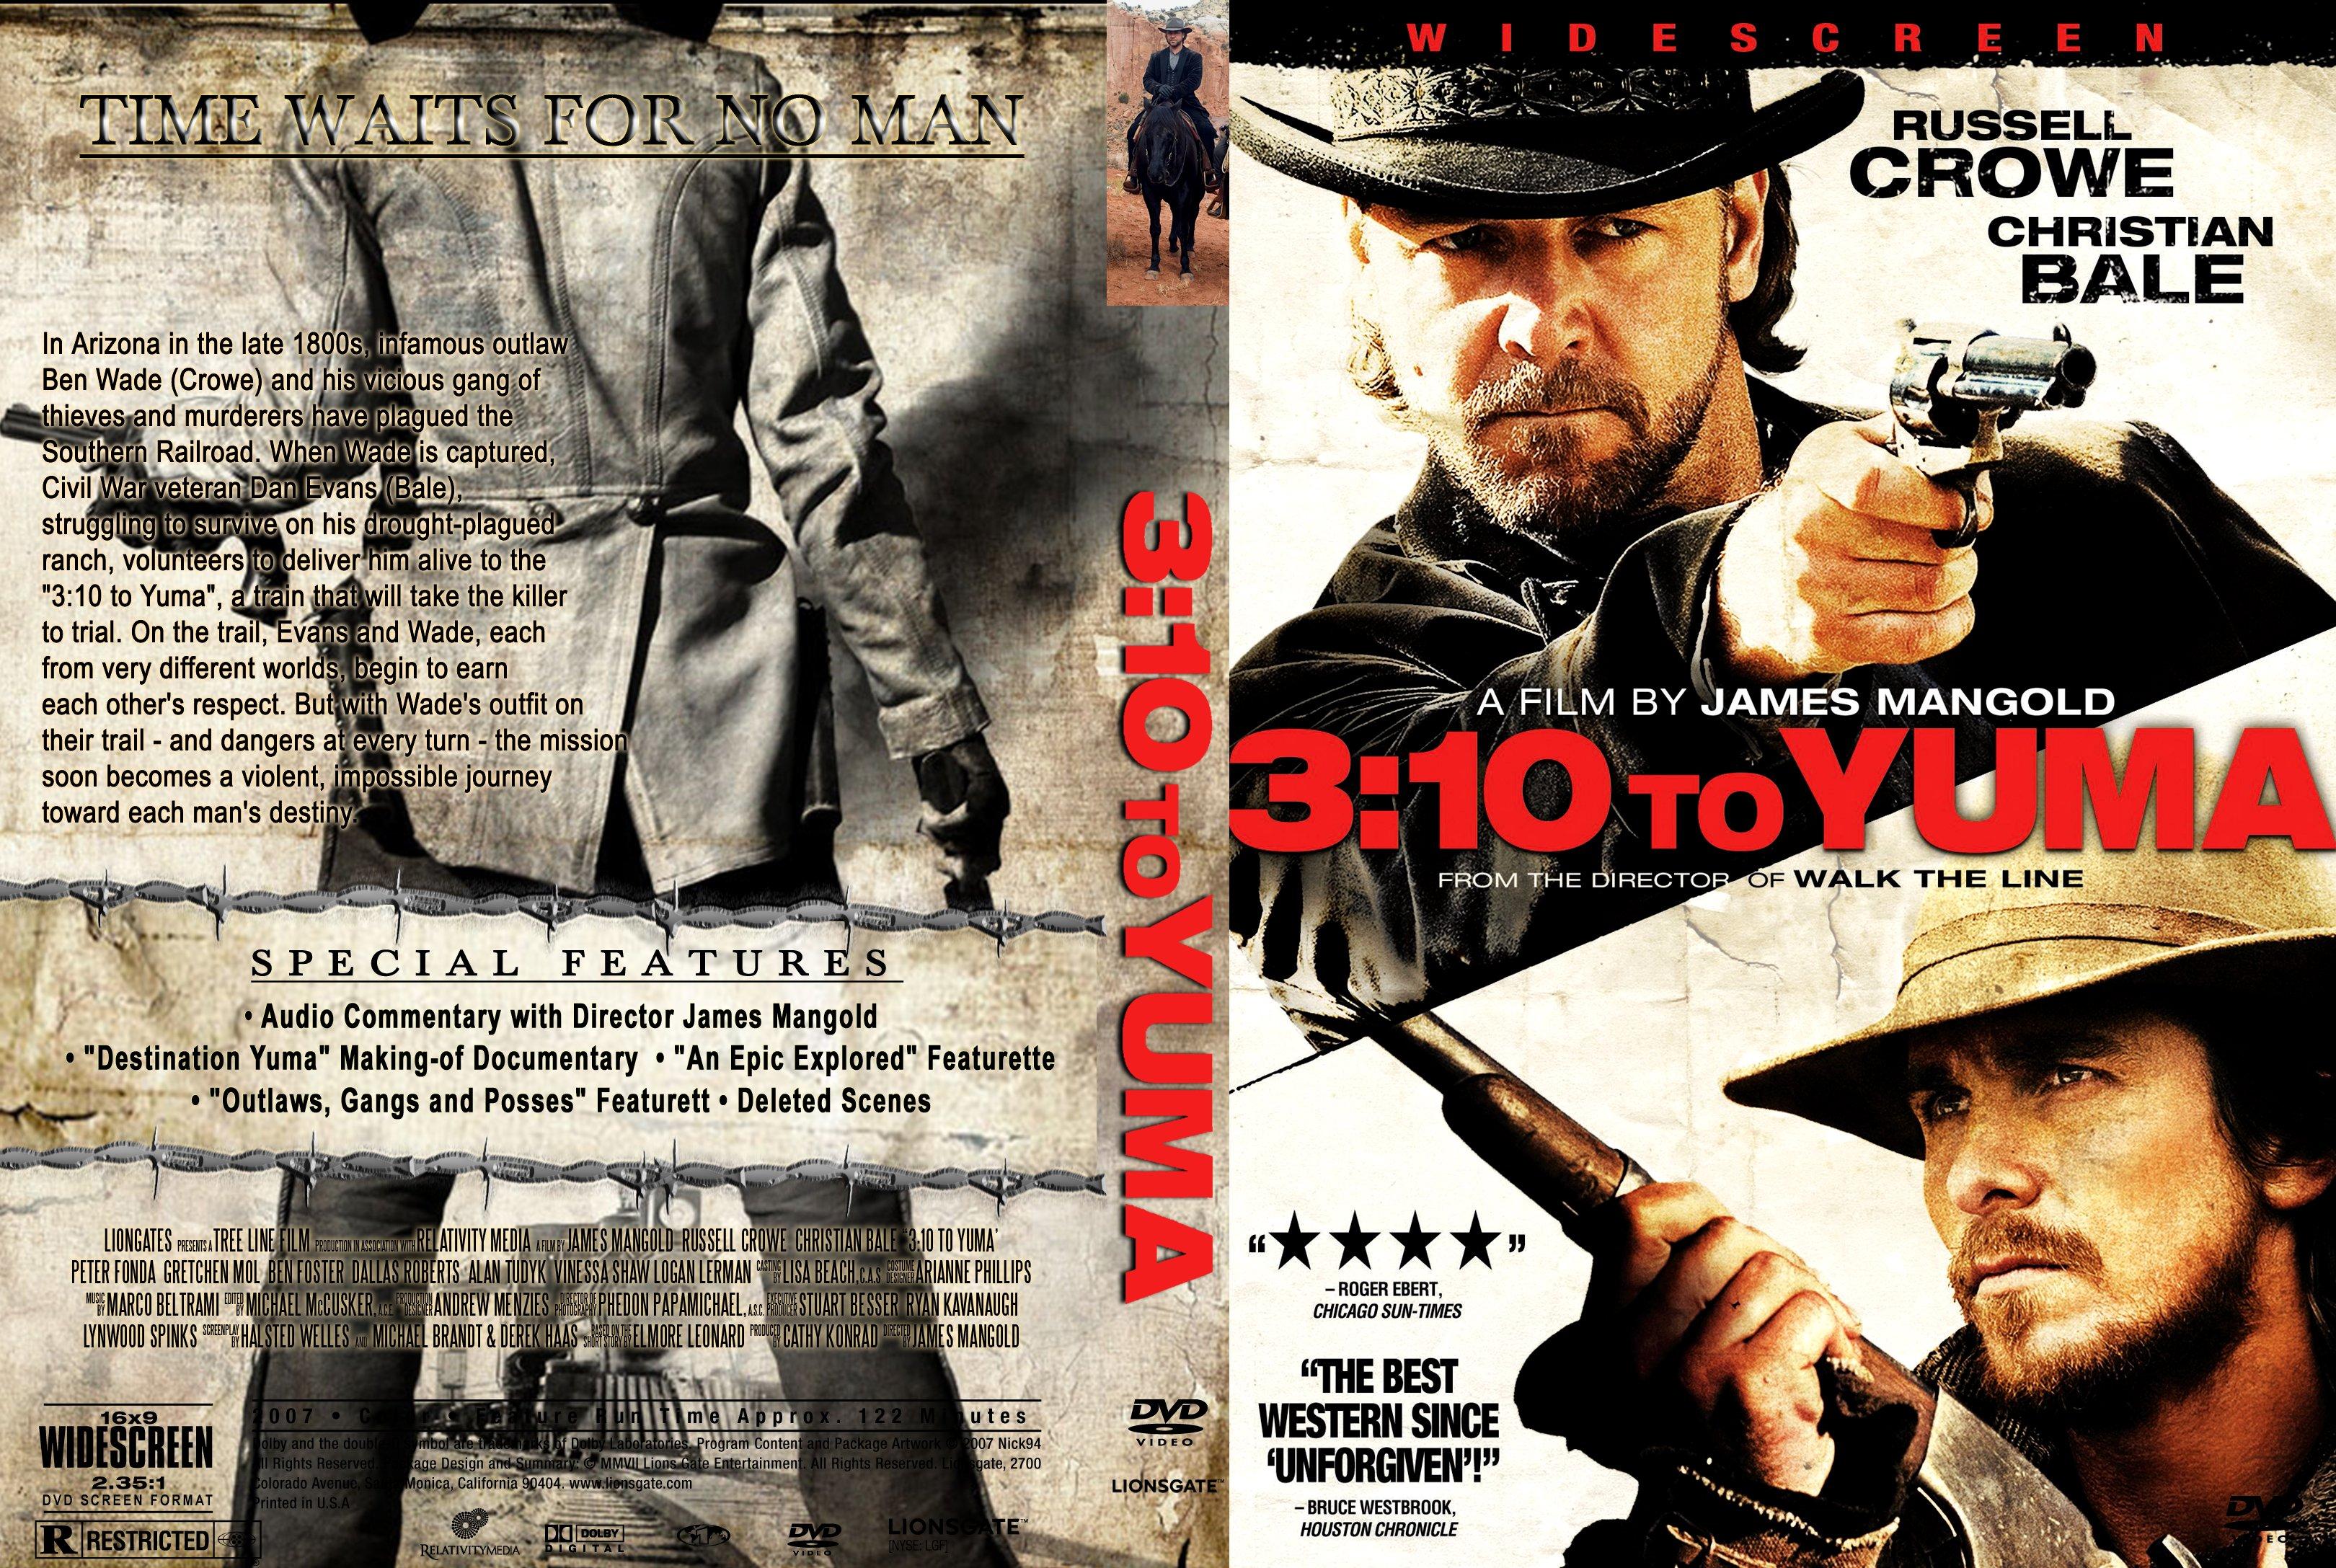 Box sk 3 10 to yuma 2007 high quality dvd blueray movie